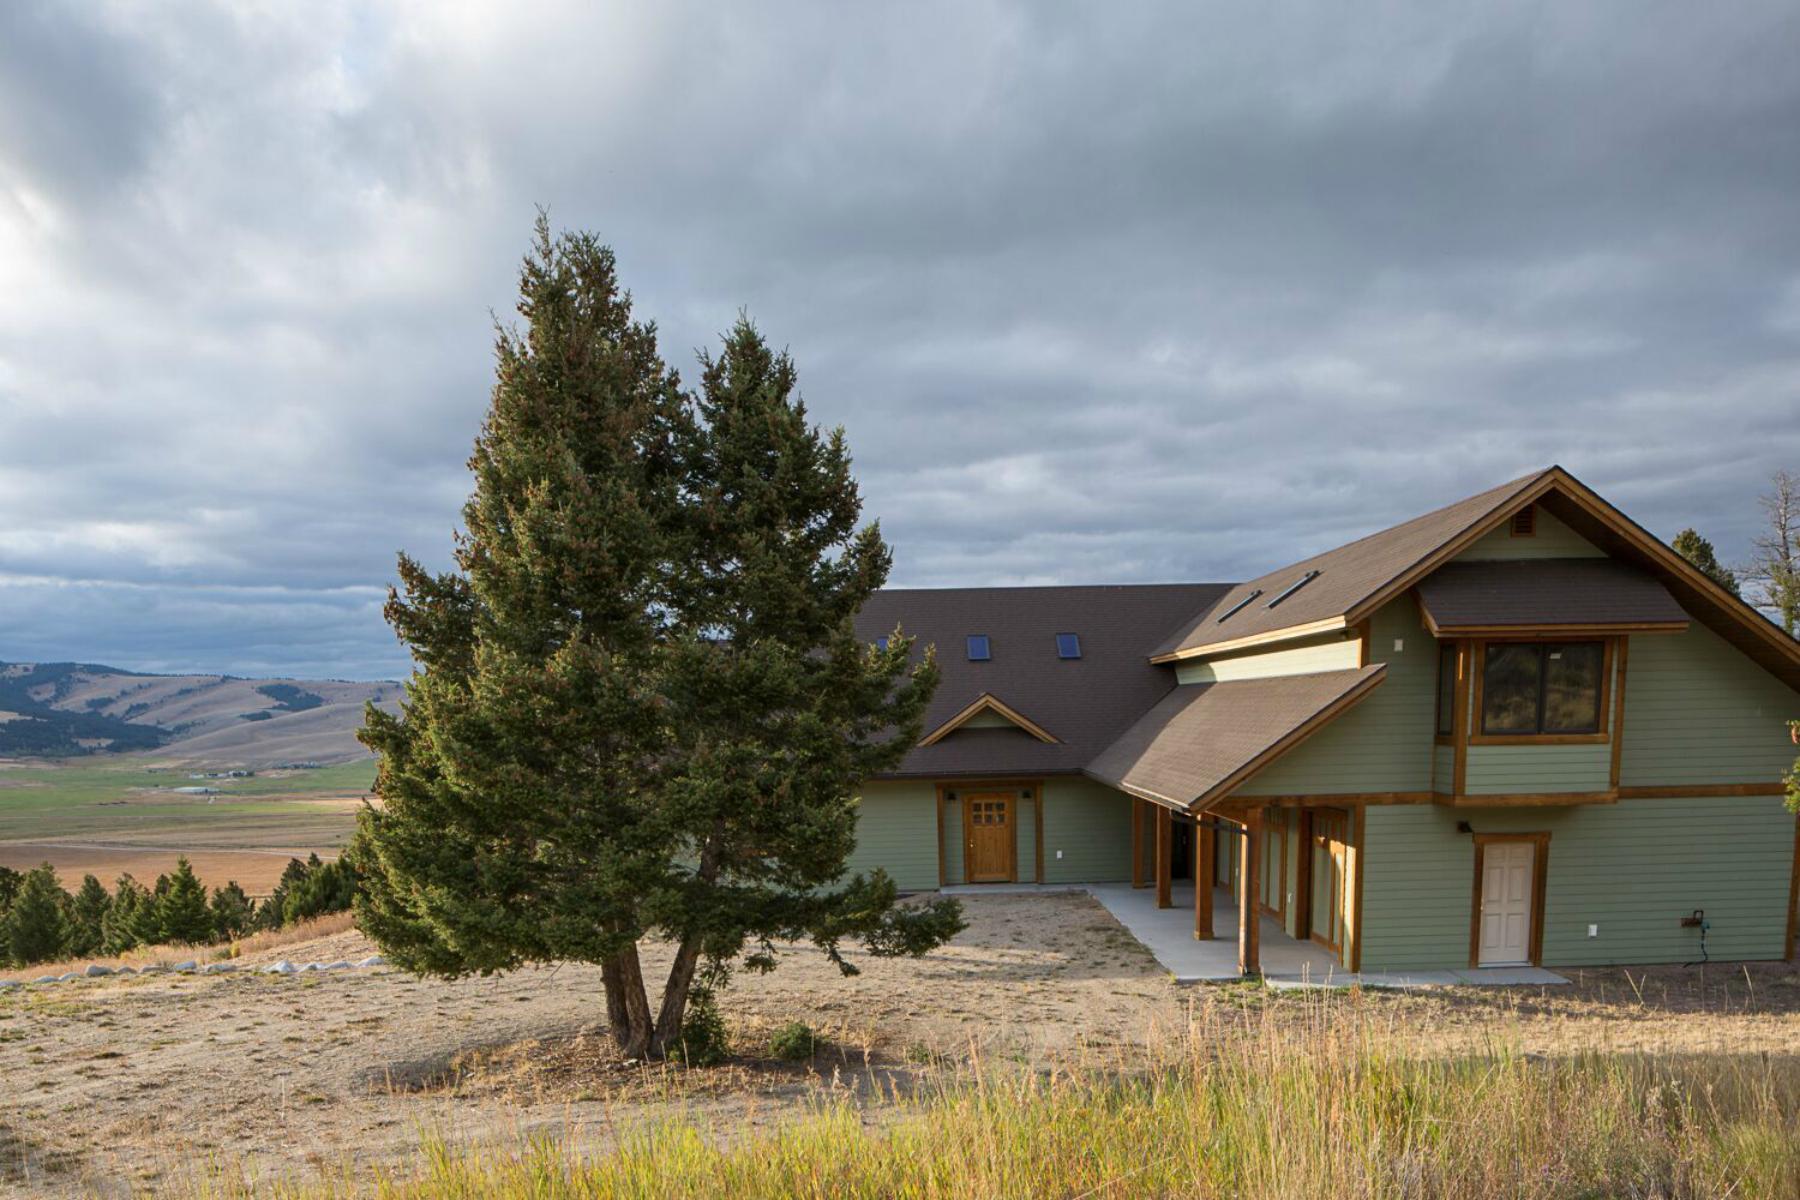 Villa per Vendita alle ore 19 Deer Ln , Philipsburg, MT 59858 19 Deer Ln Philipsburg, Montana, 59858 Stati Uniti